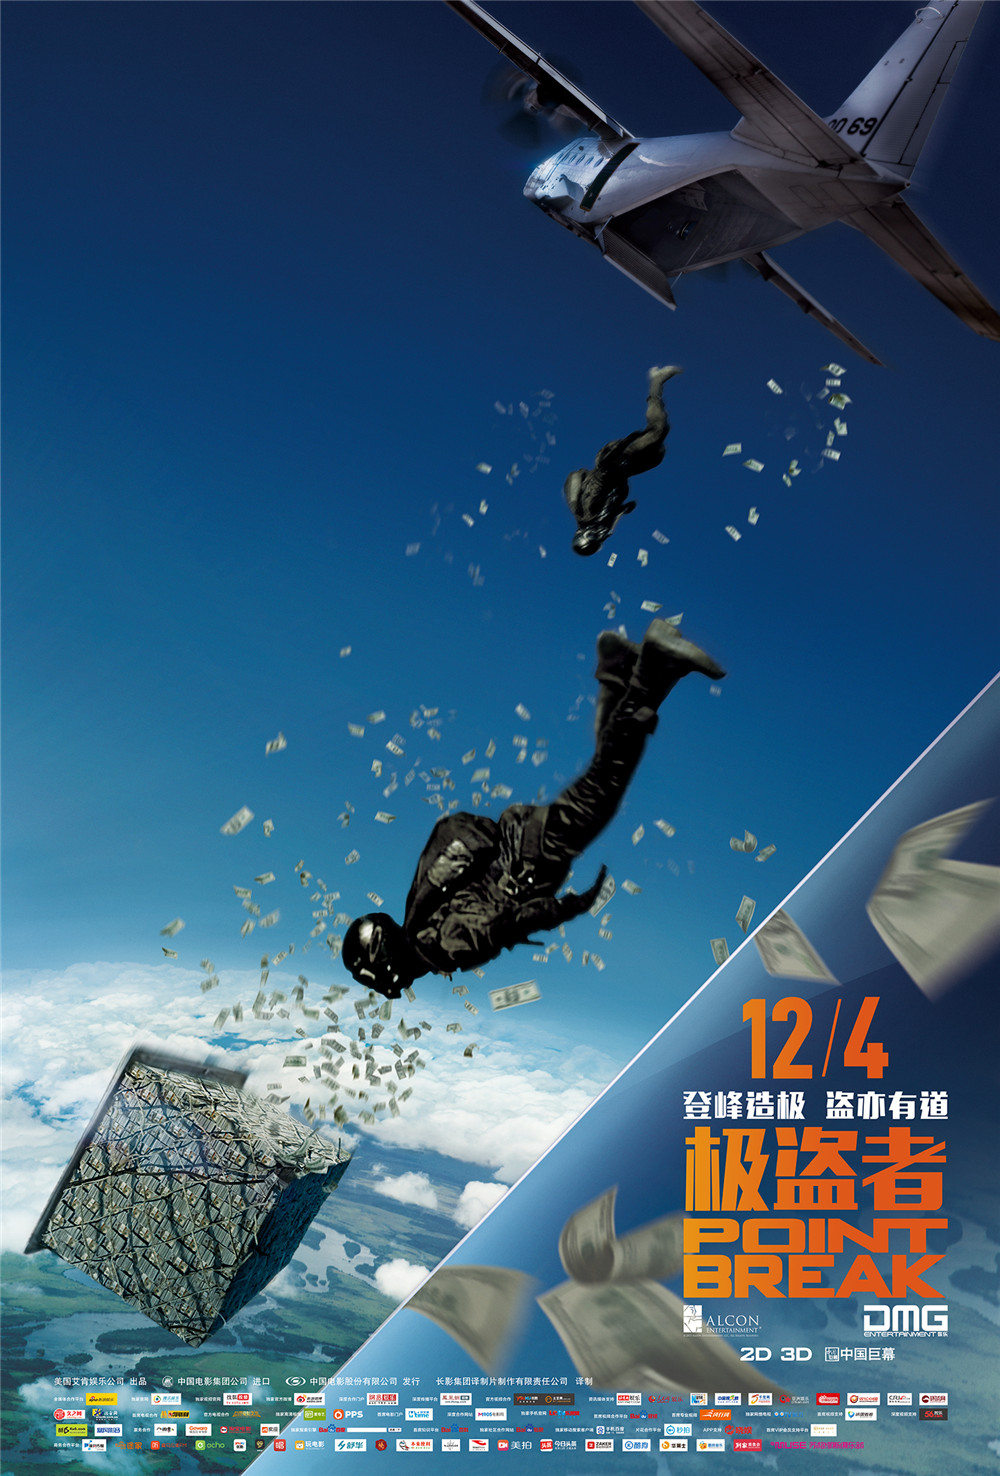 【3D】2015年极限运动电影《极盗者》